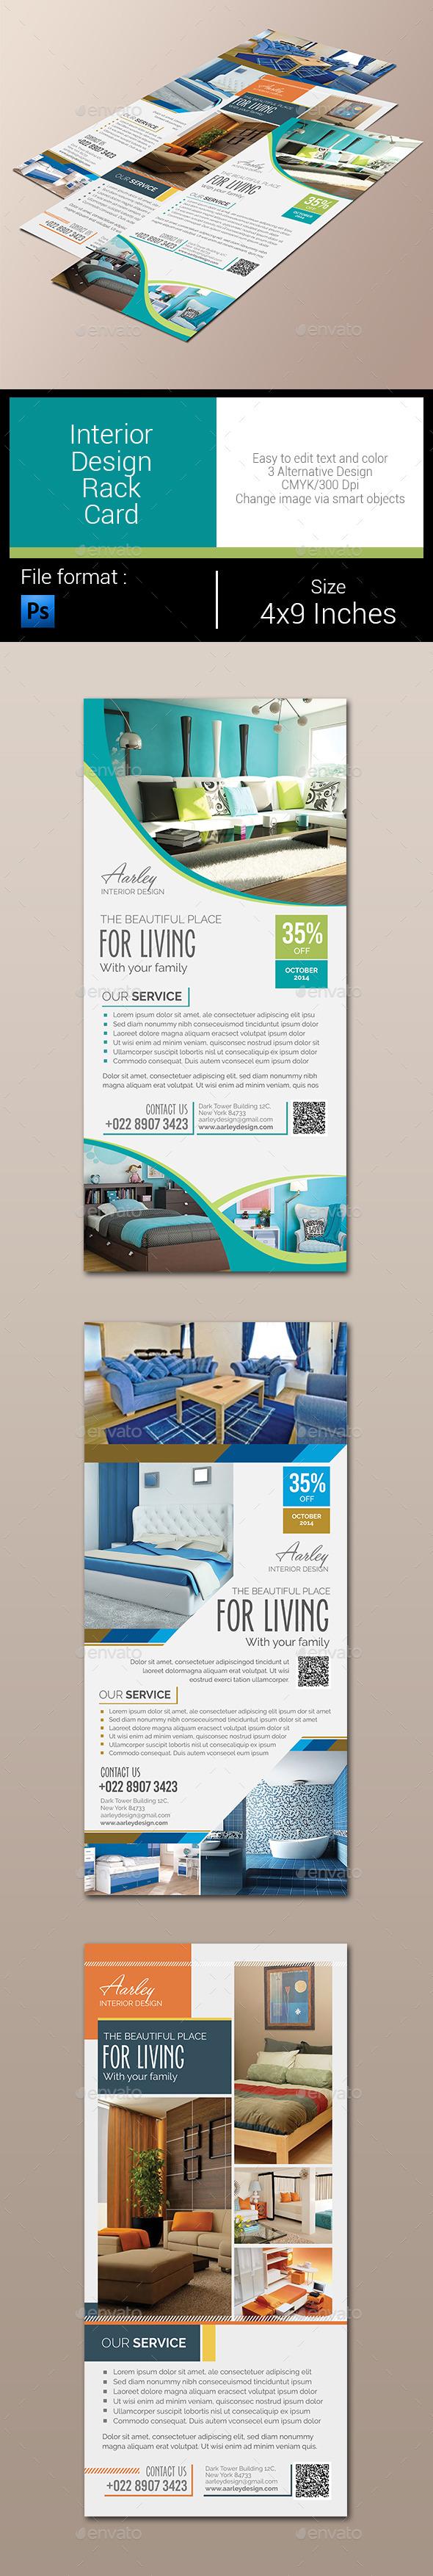 GraphicRiver Interior Design Rack Card 10497187